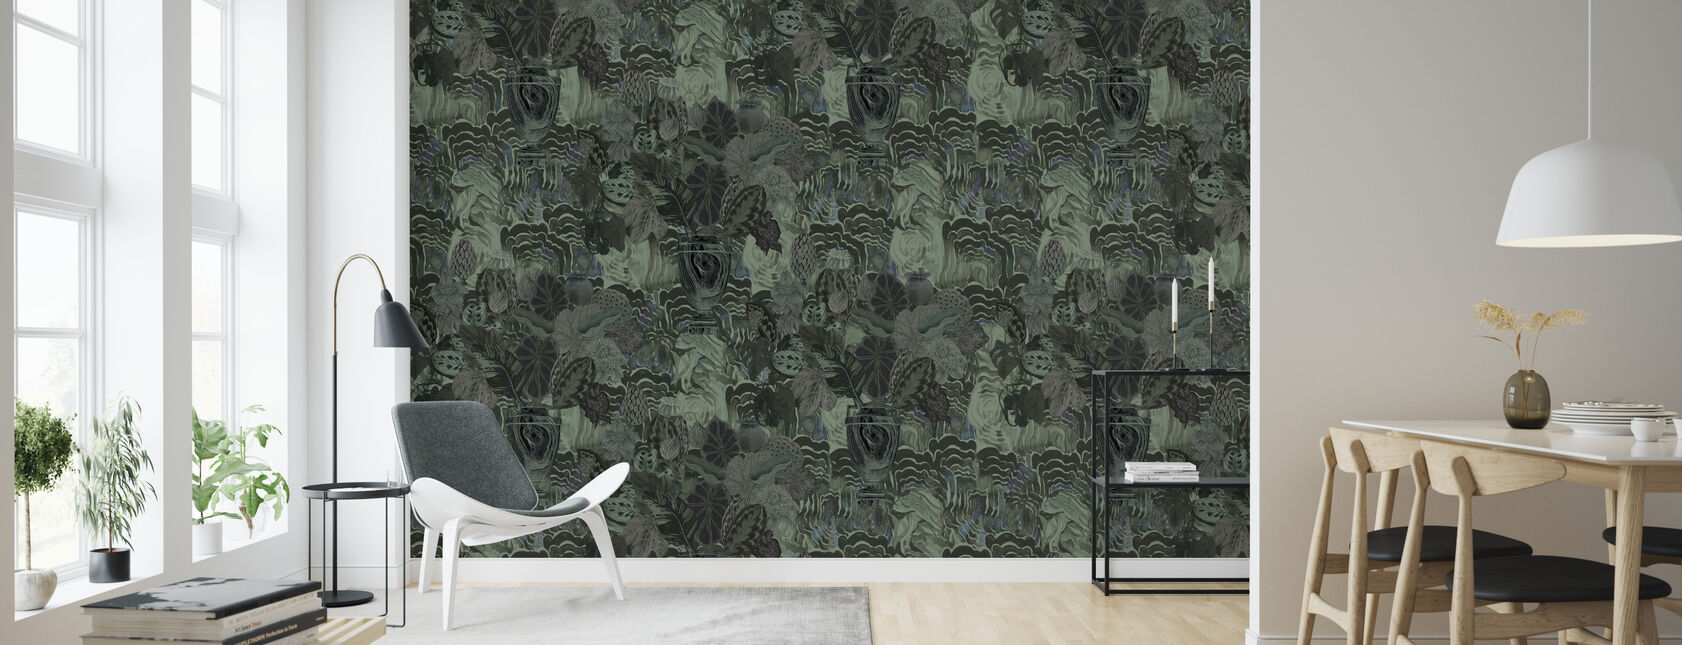 Emerald Moss - Wallpaper - Living Room